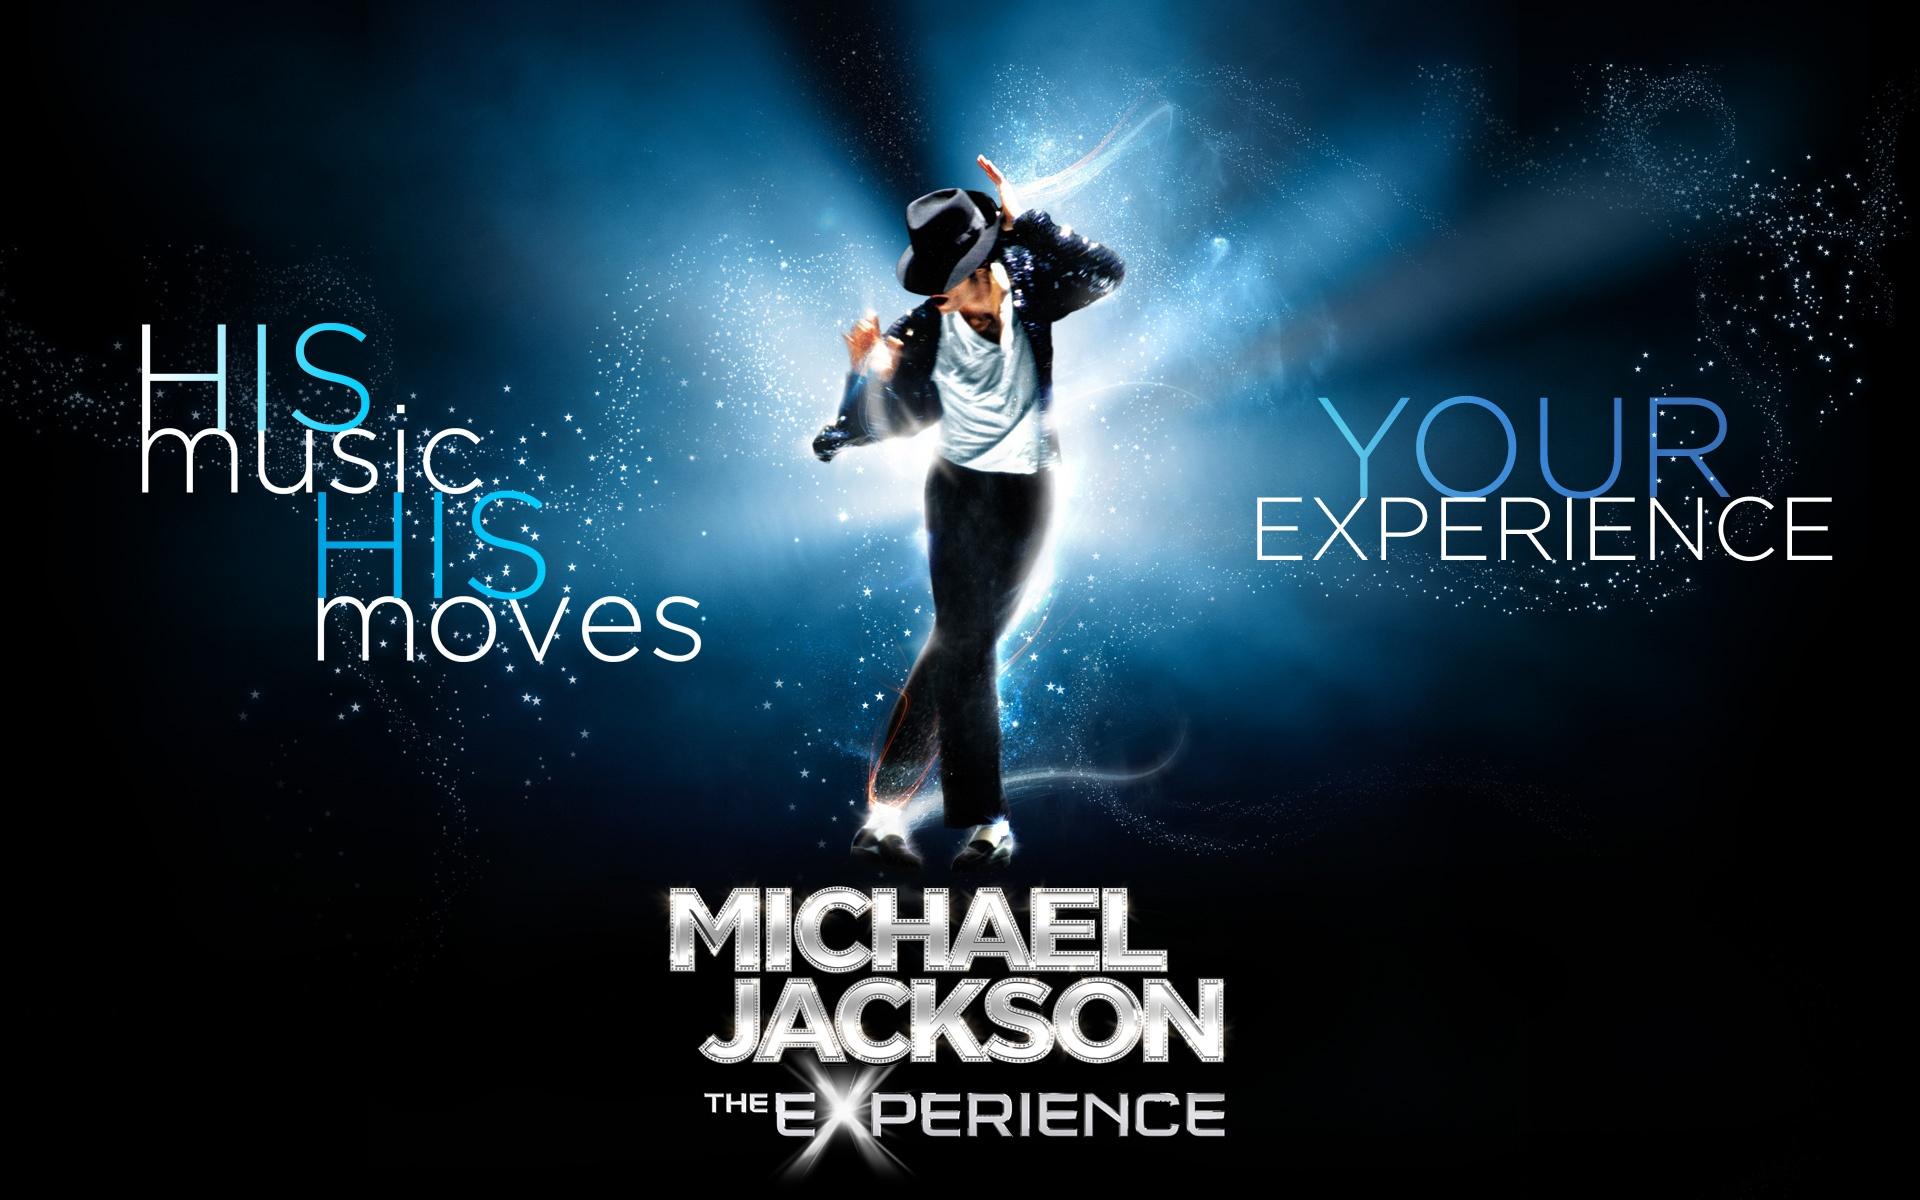 Michael Jackson キング・オブ・ポップ!マイケル・ジャクソン